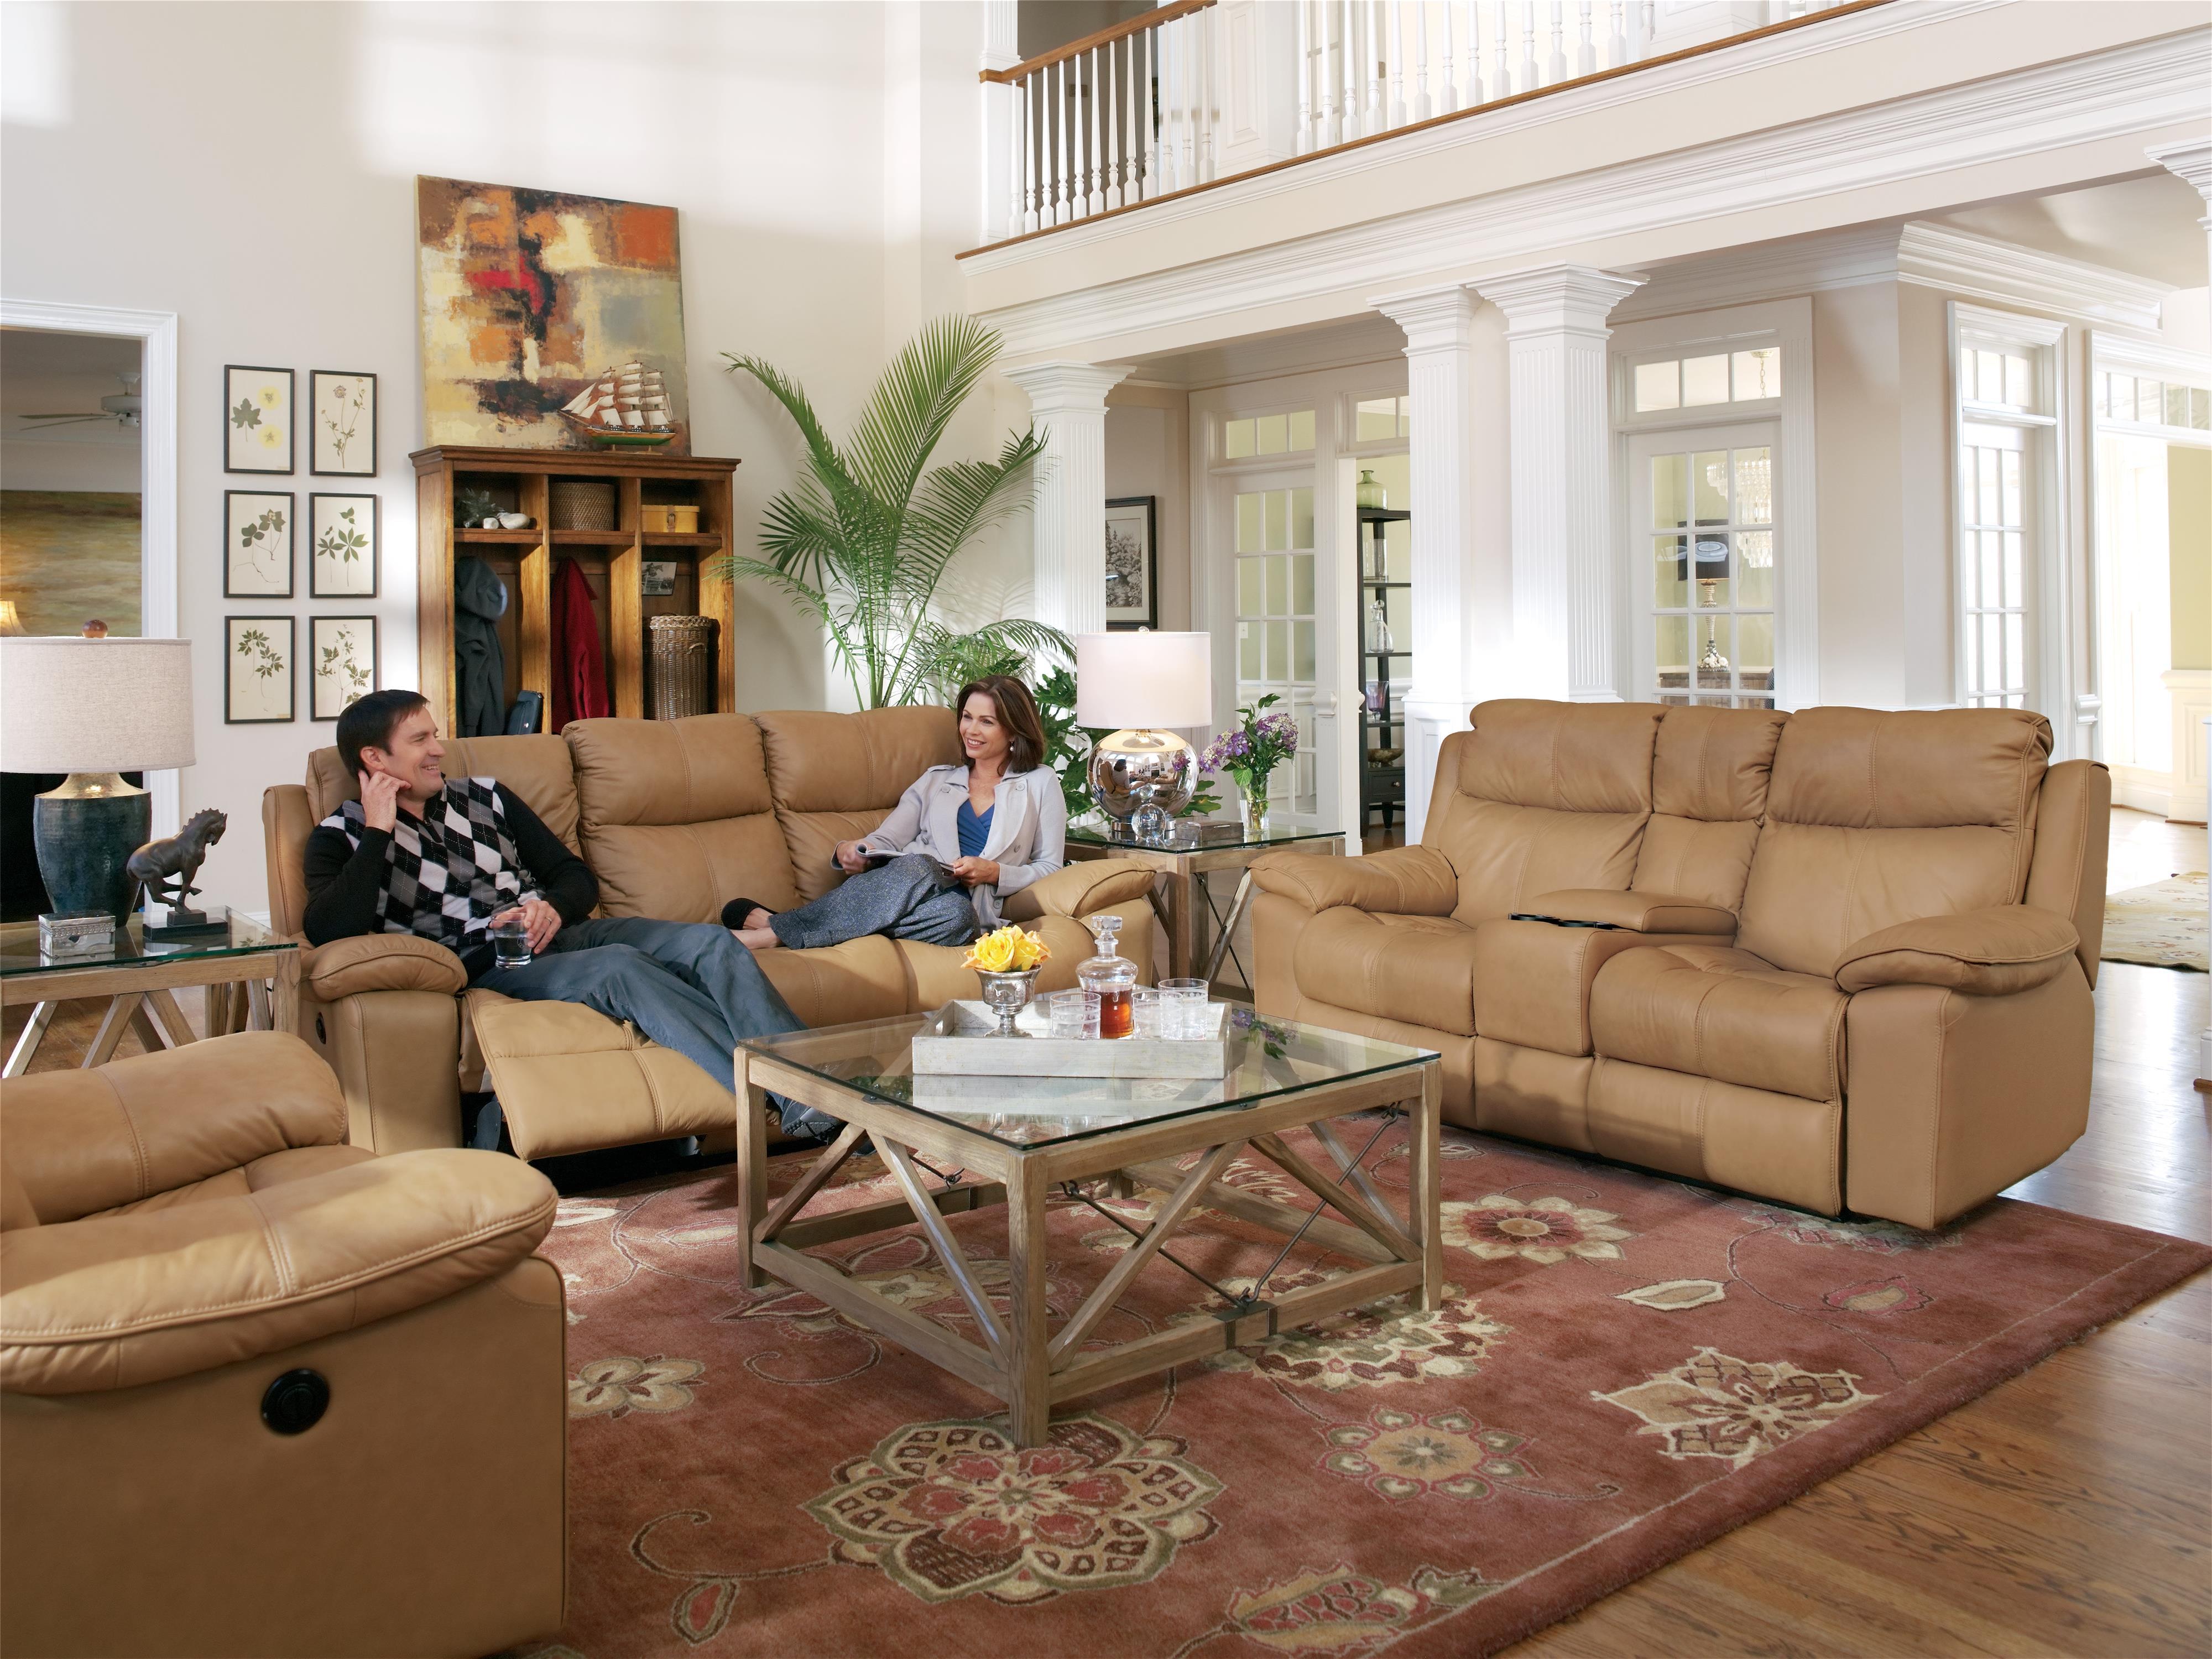 Flexsteel Latitudes Julio Power Reclining Sofa with Bustle Backs